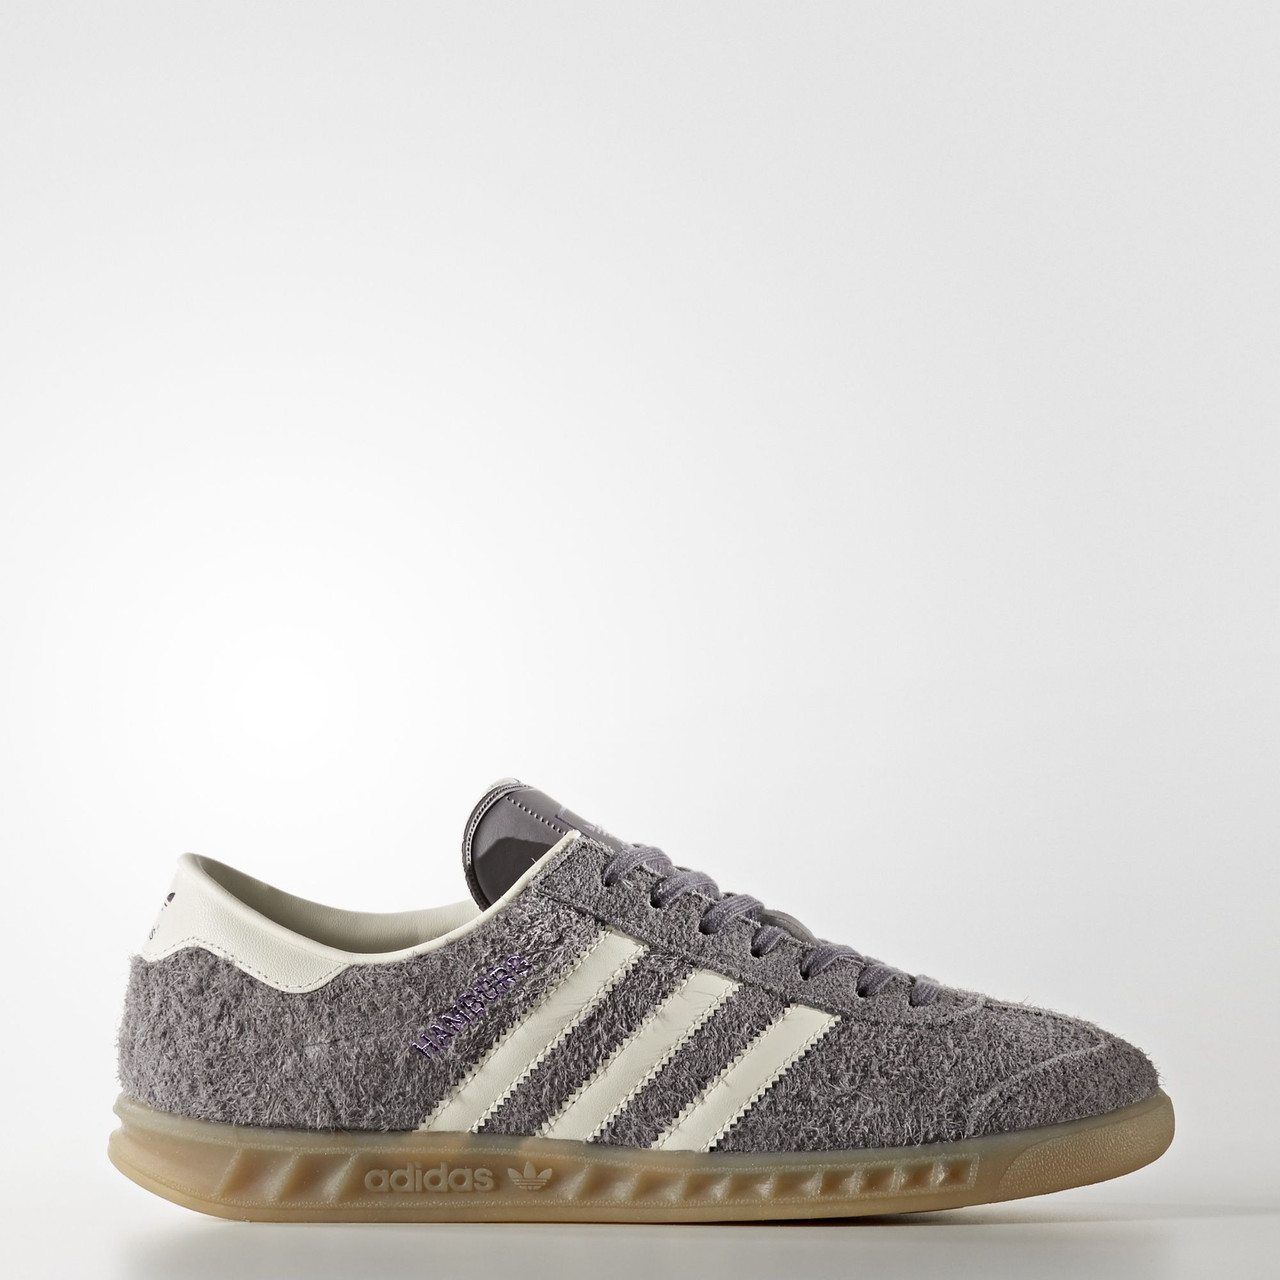 c1162ee20895 Женские кроссовки Adidas Originals Hamburg (Артикул  BB5109) -  Интернет-магазин «Эксперт